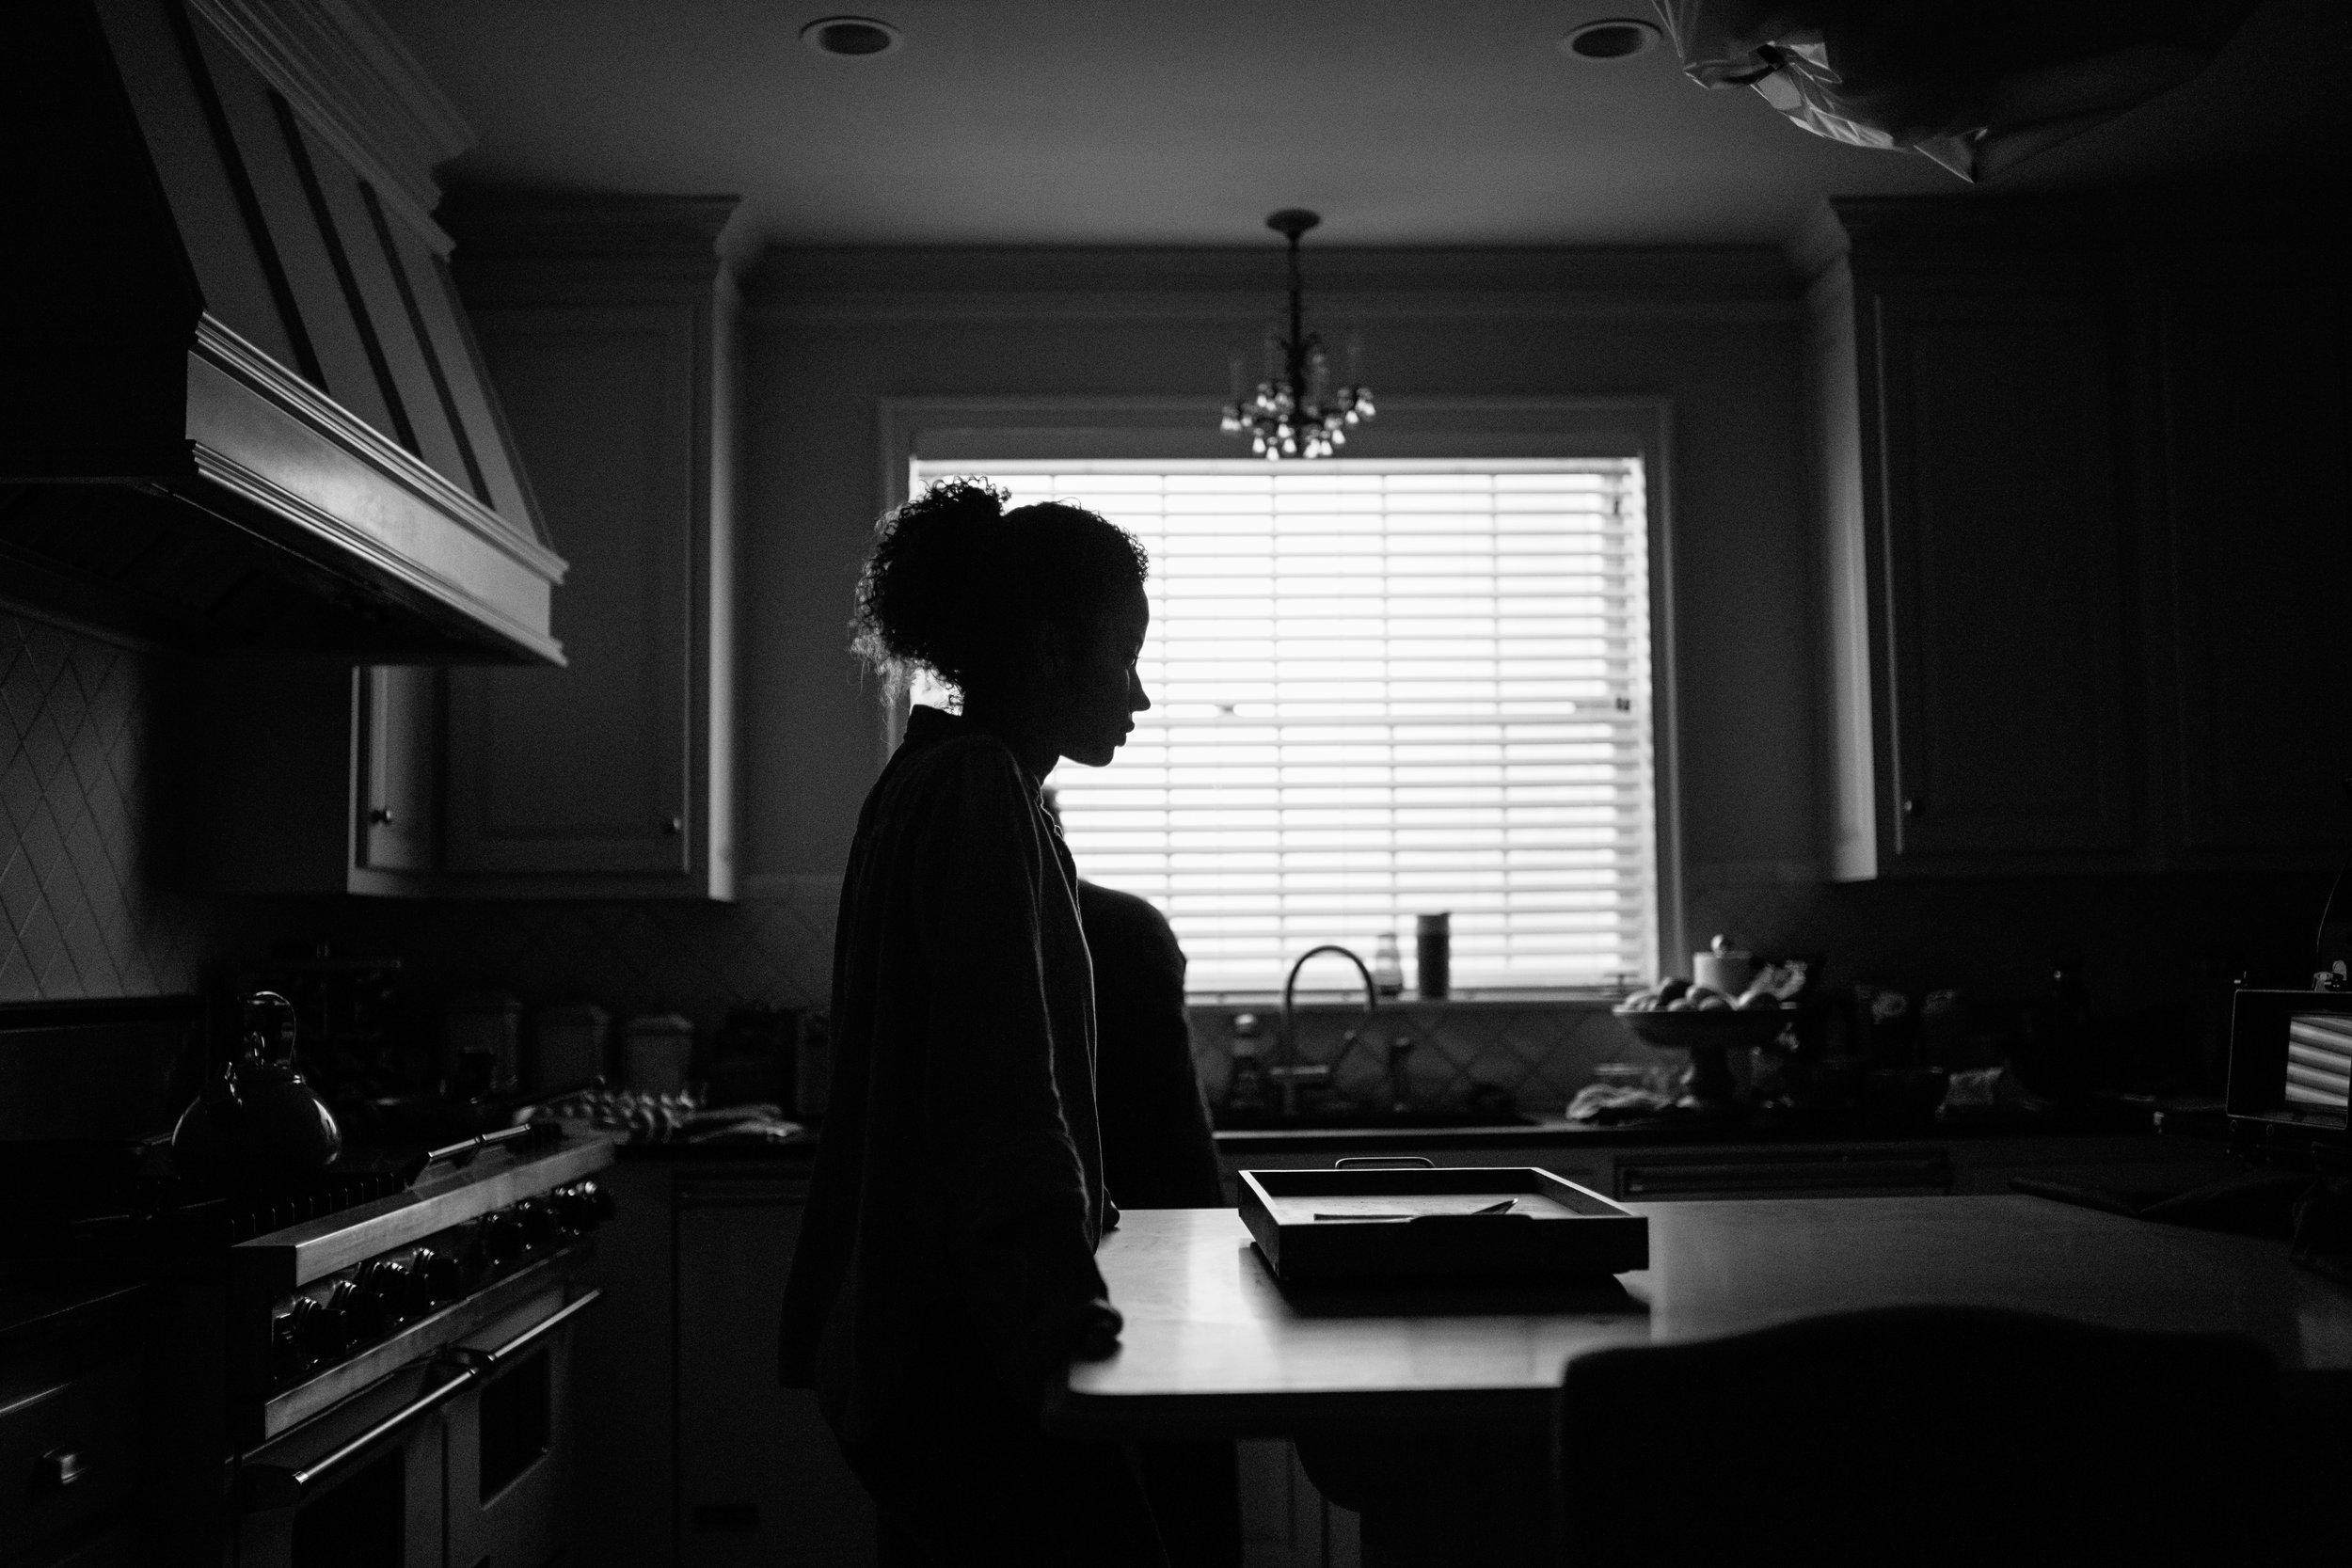 Rosalind_Julia Fenner-91.jpg